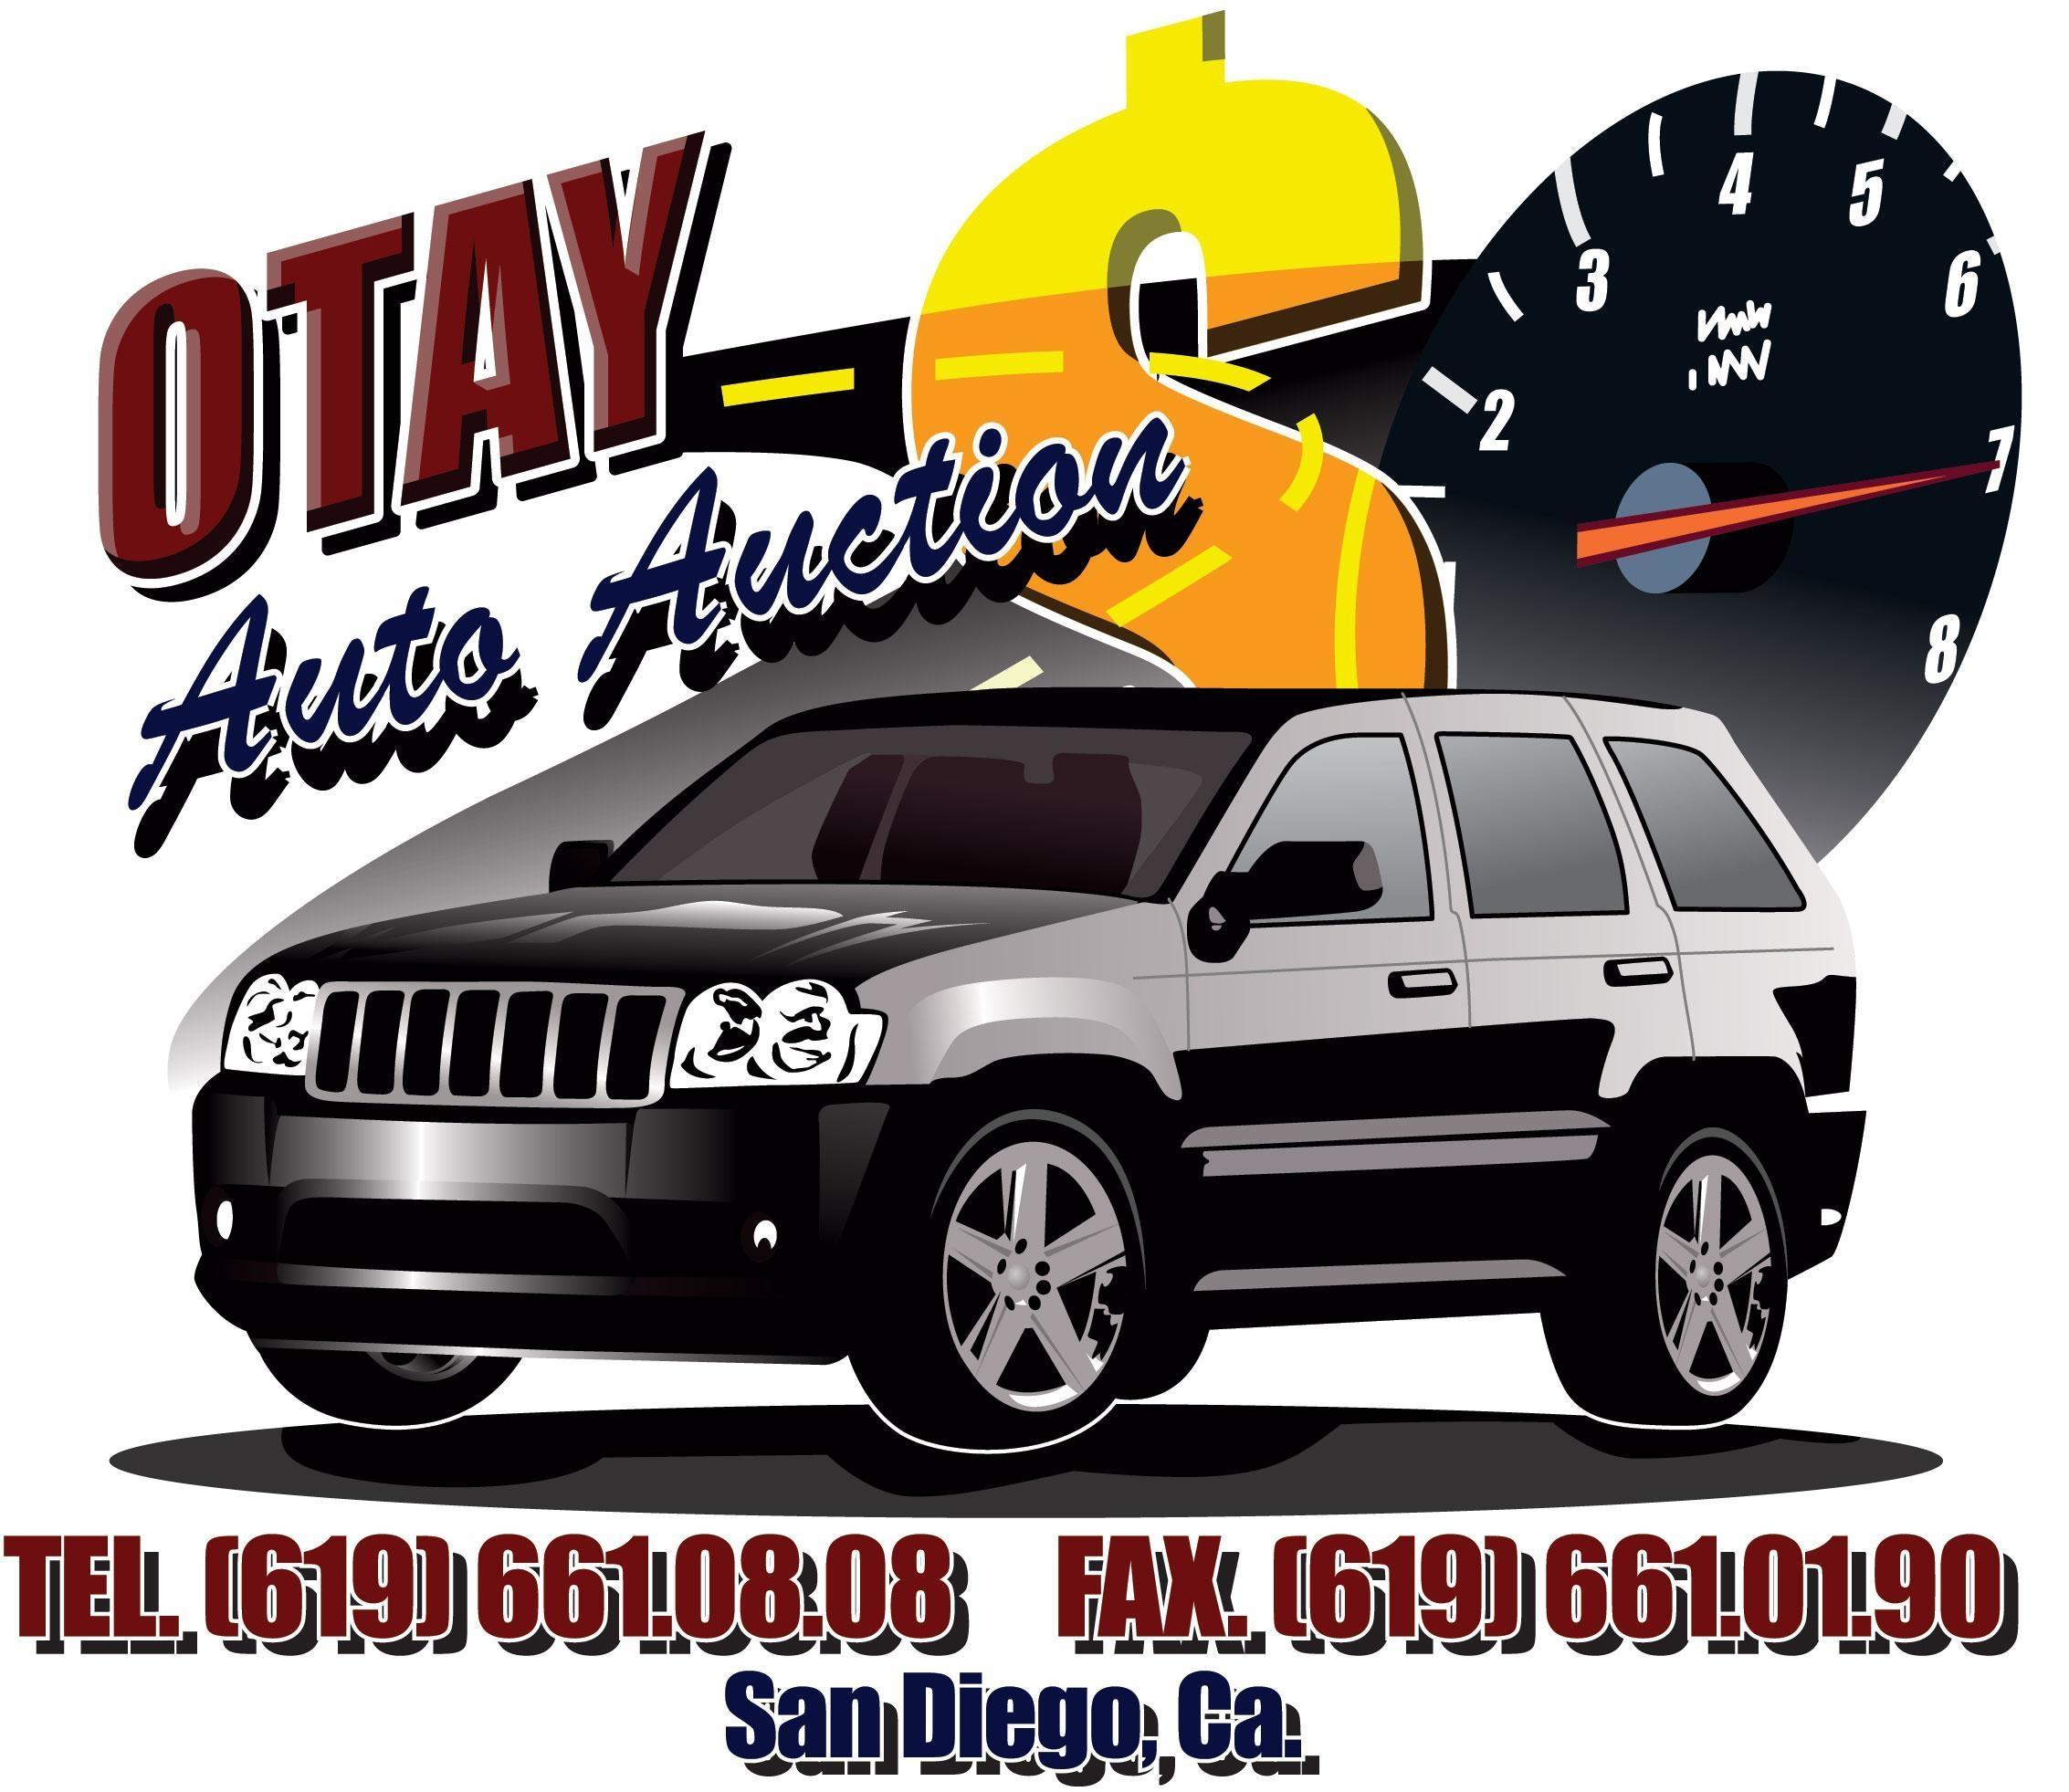 Otay auto auction 8955 siempre viva rd san diego ca for Us motors san diego